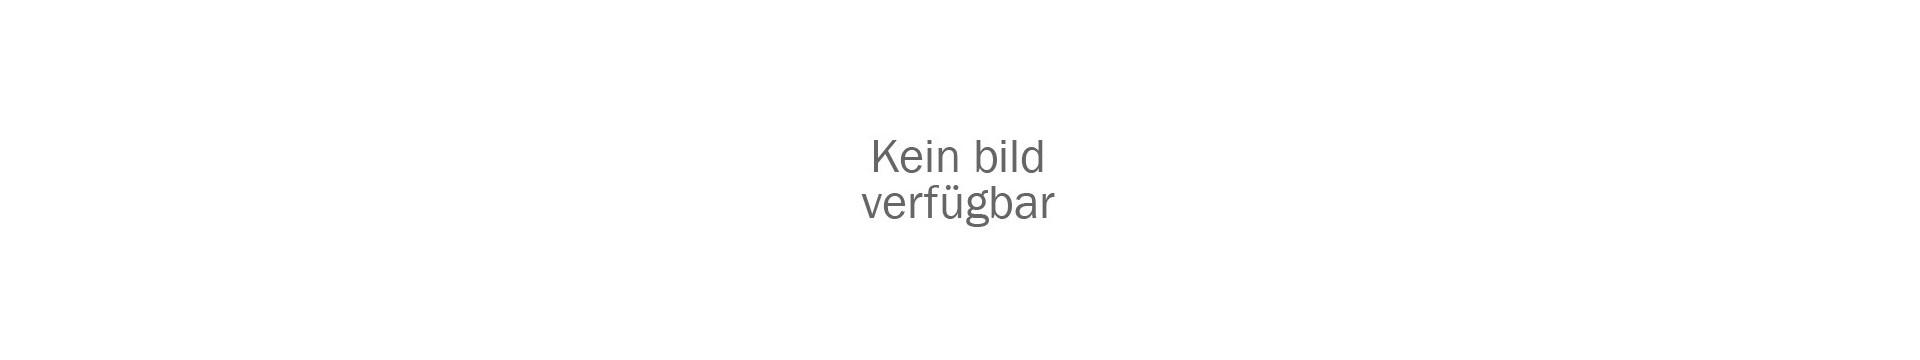 Schränke & Kommoden